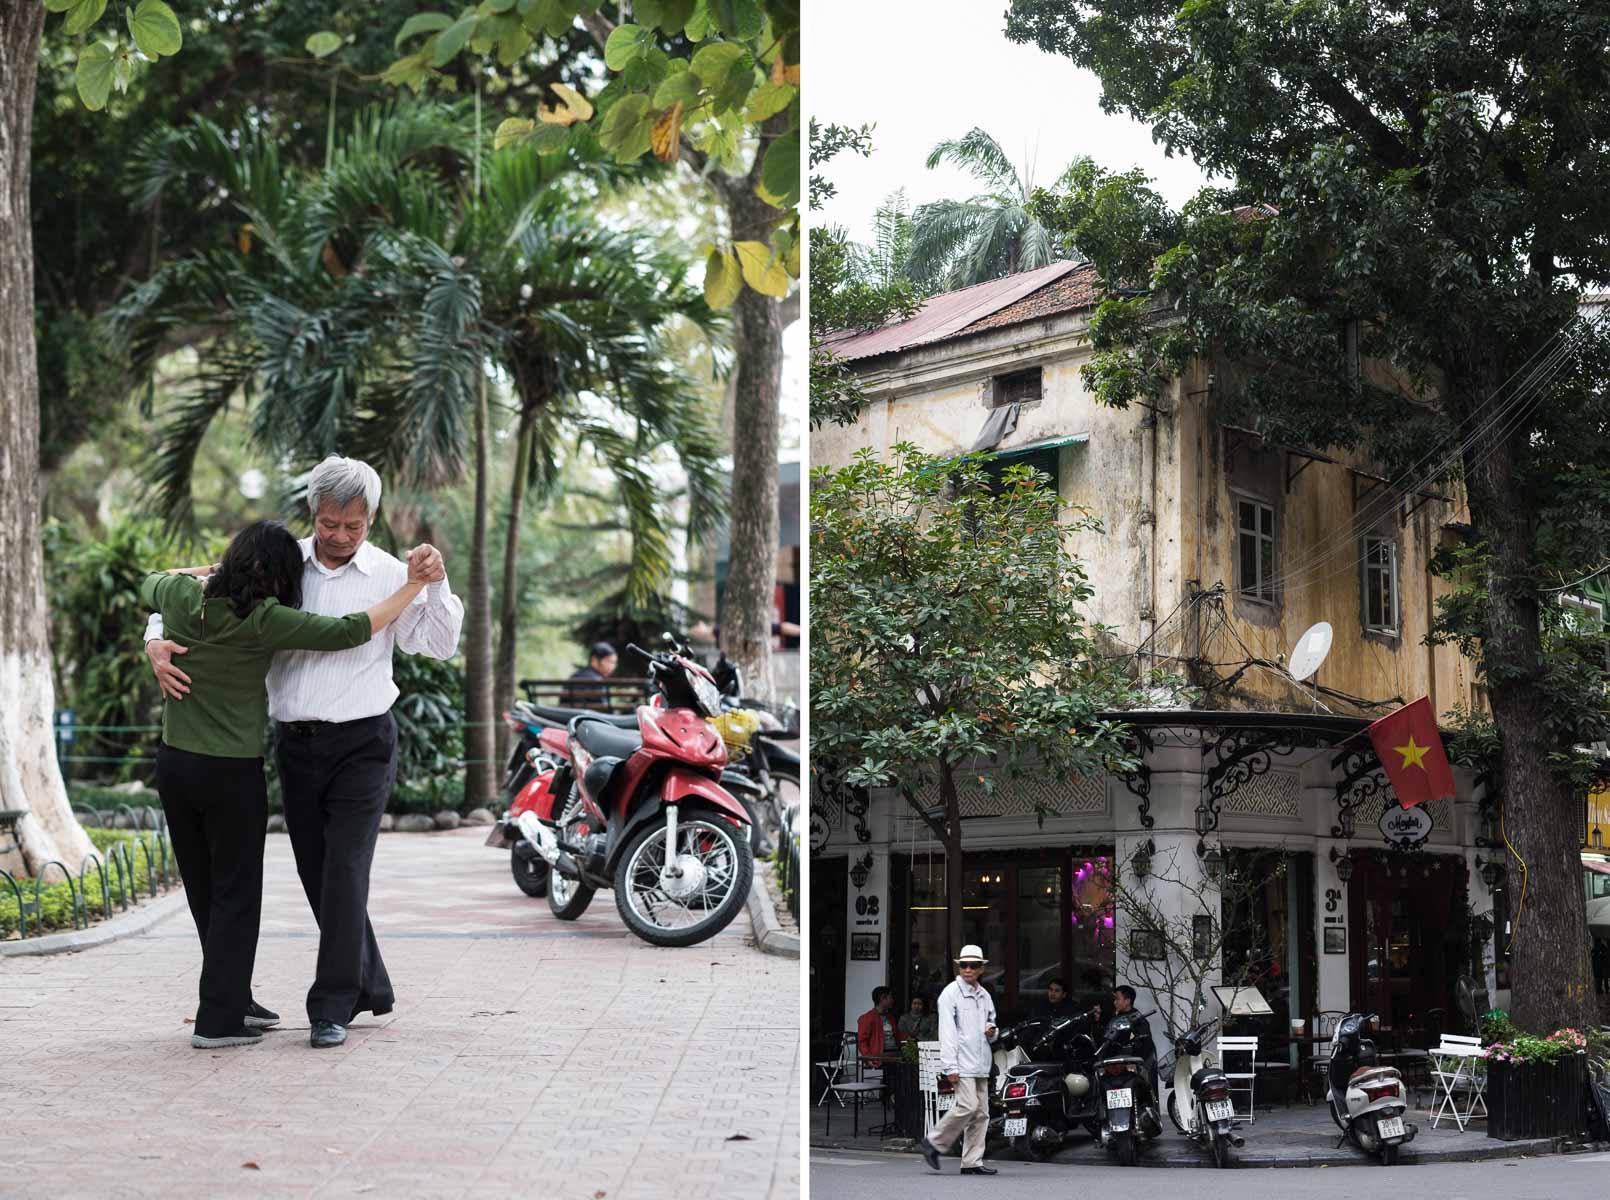 Daily life, Hanoi, Vietnam